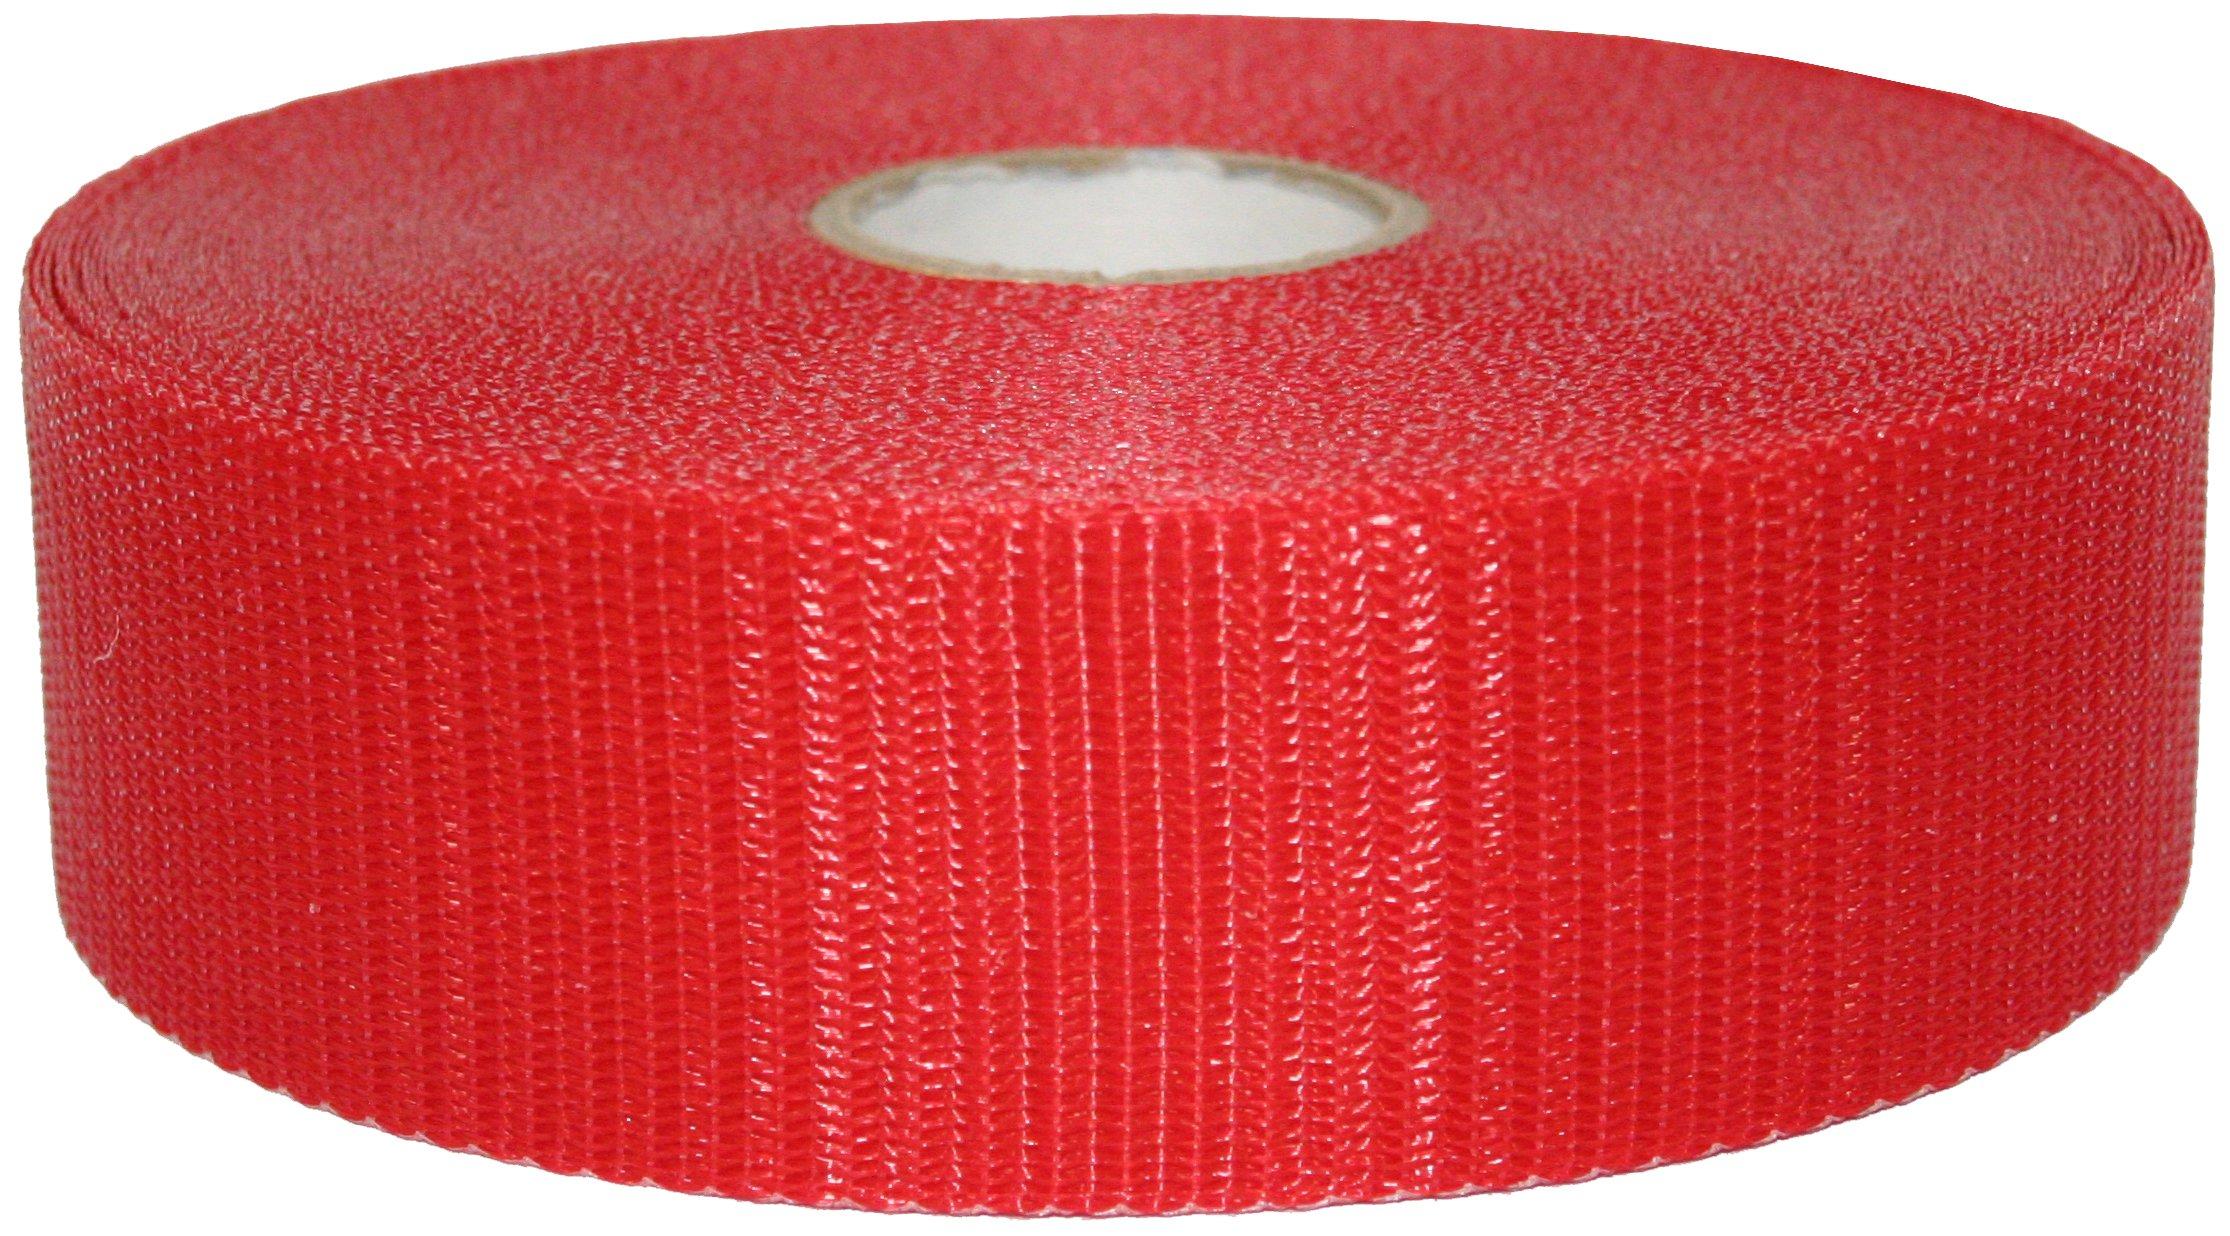 Presco BW2R150-658 150' Length x 2'' Width, Polypropylene, Red Woven Barricade Tape (Pack of 48)